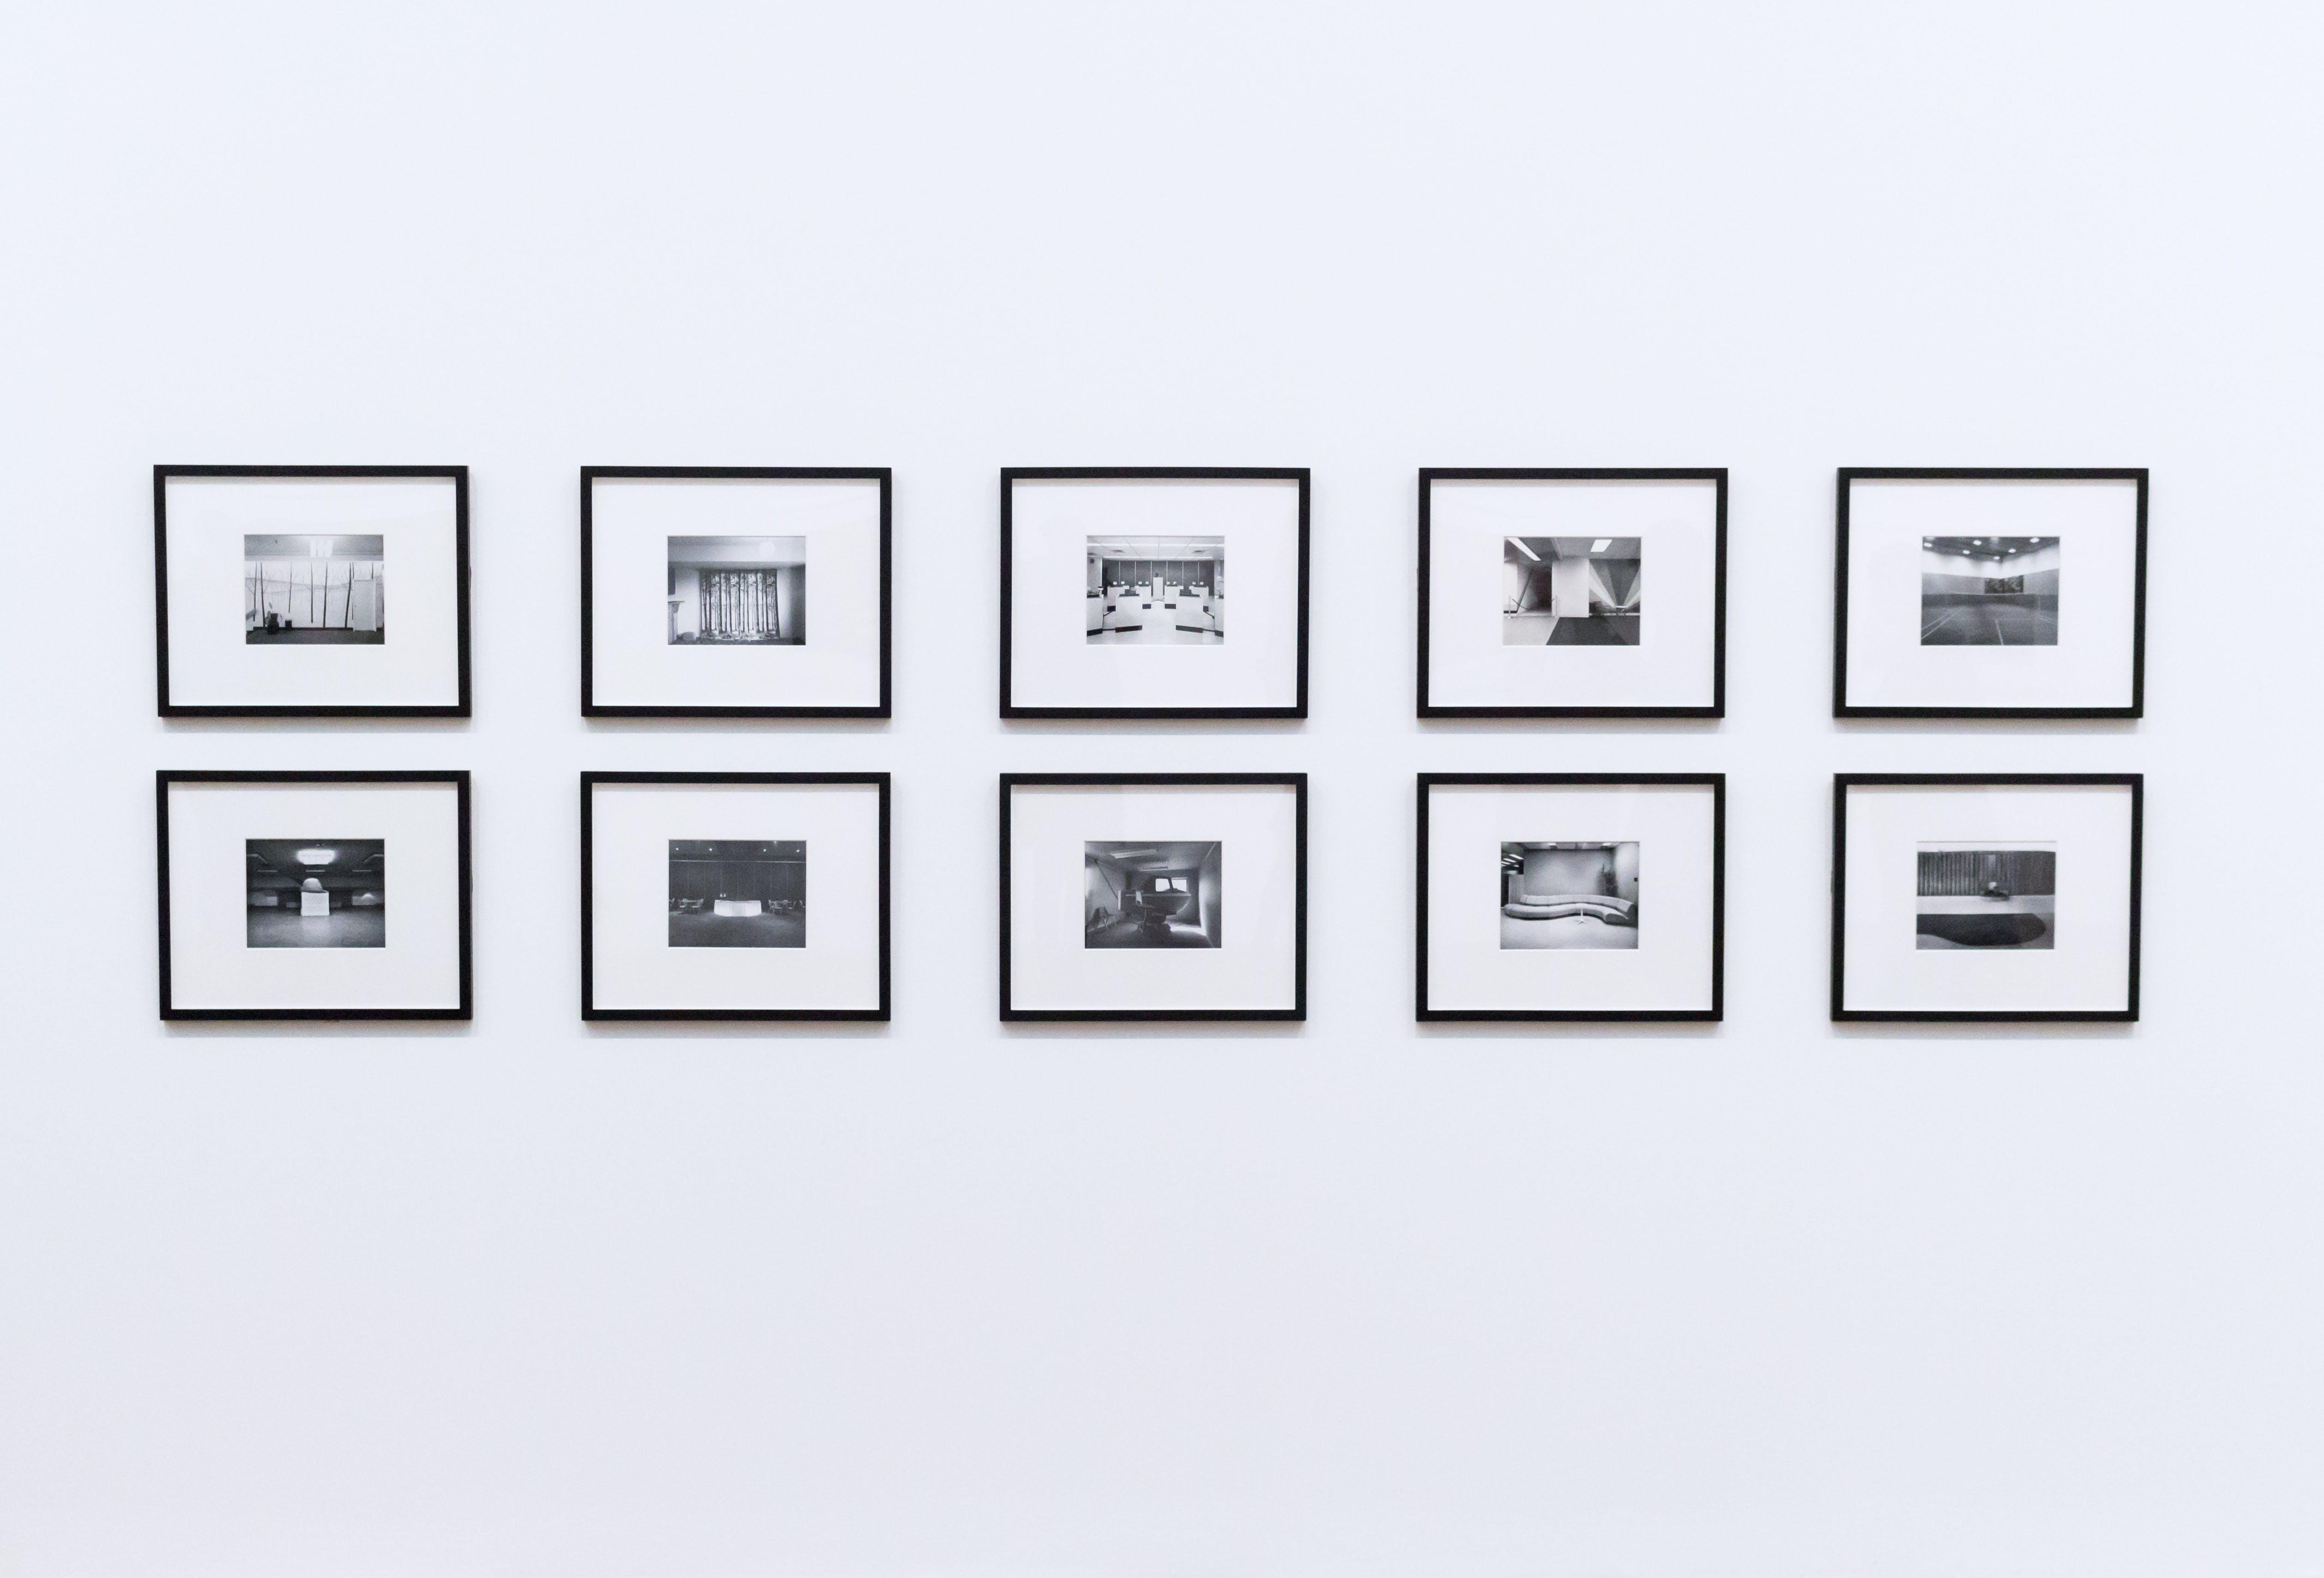 billede, billeder, billedramme